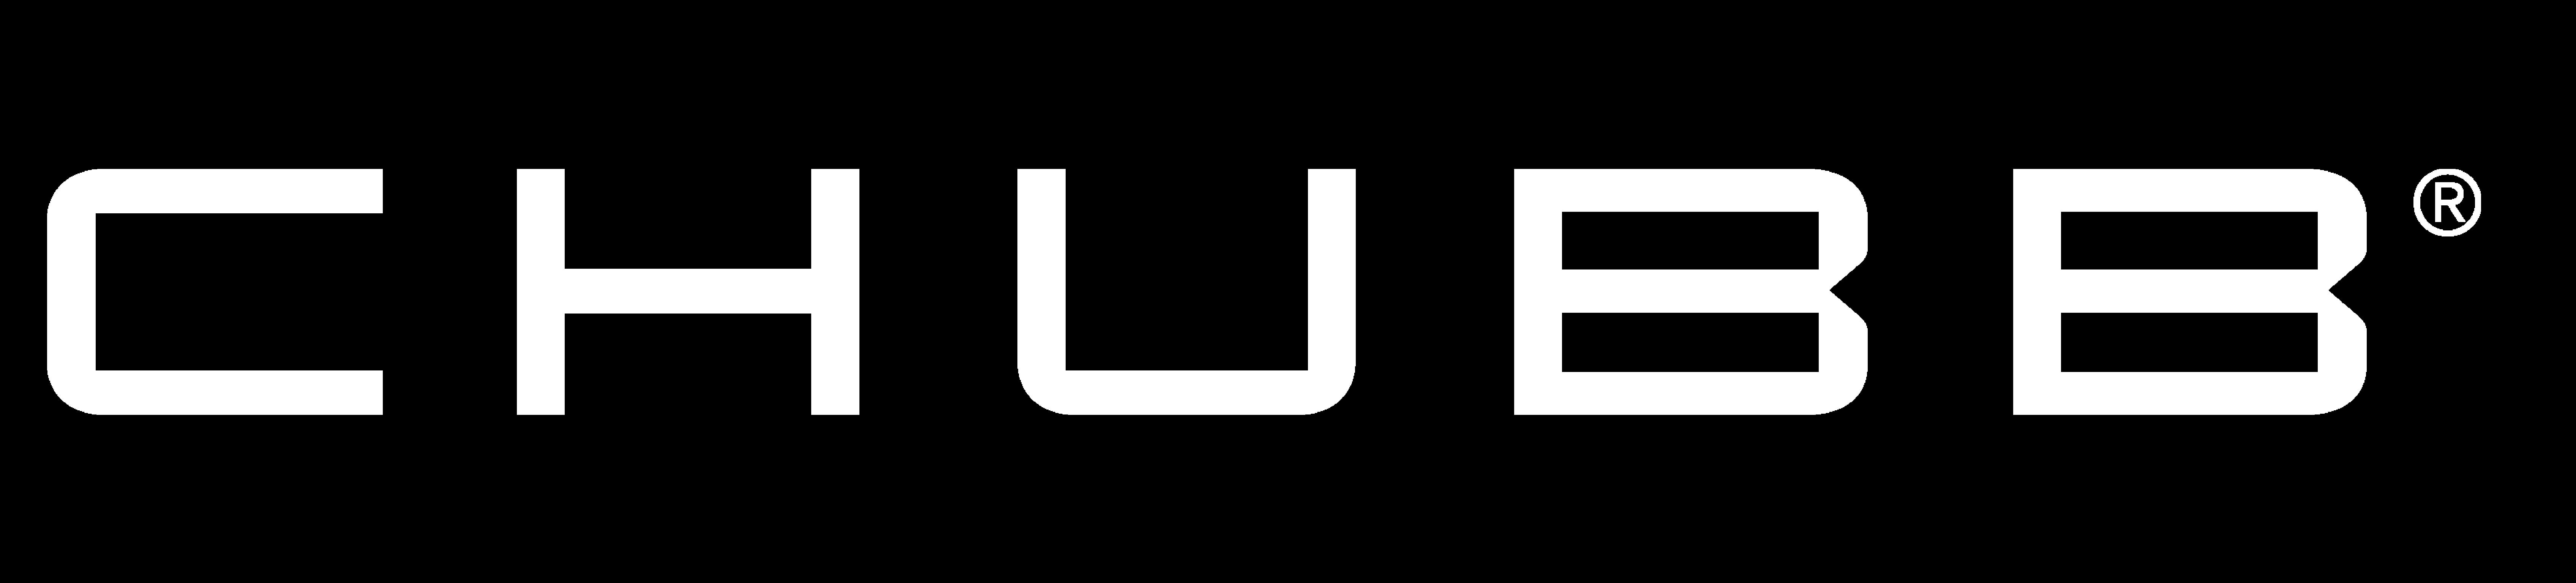 Chubb logo white-5